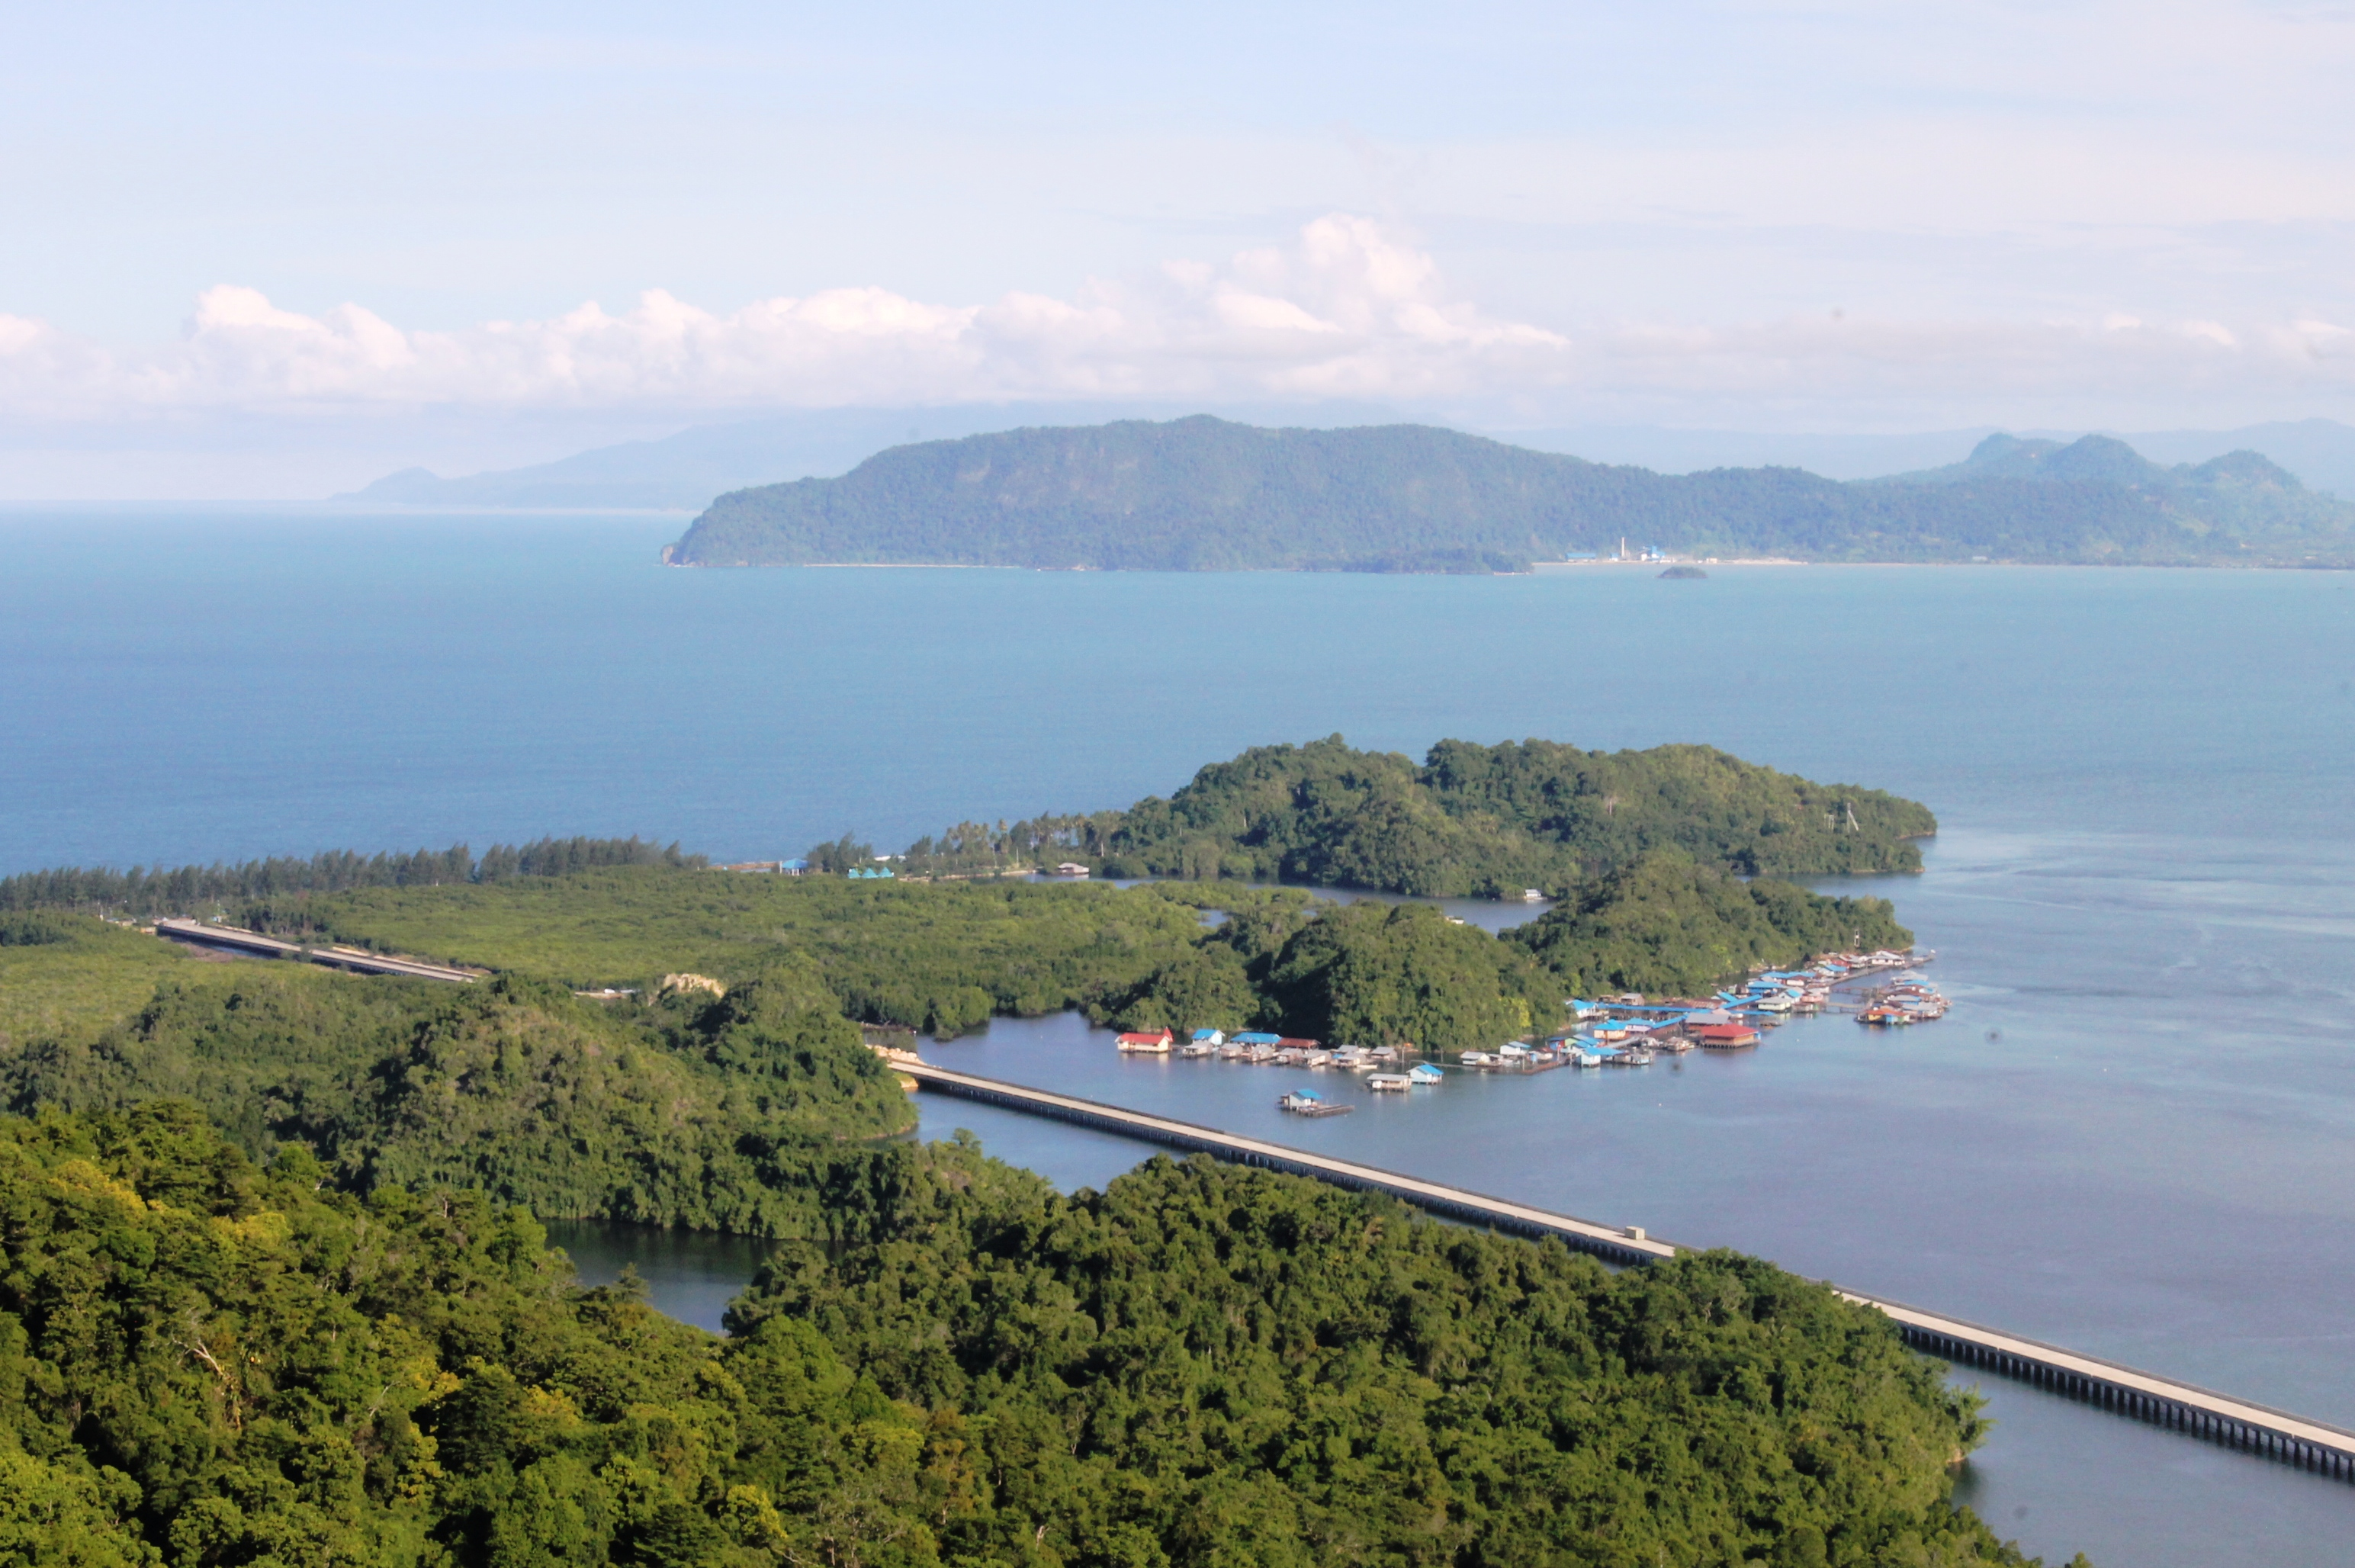 Dua Jembatan Daerah Perbatasan Bakal Jadi Ikon Batas Negeri Holtekam